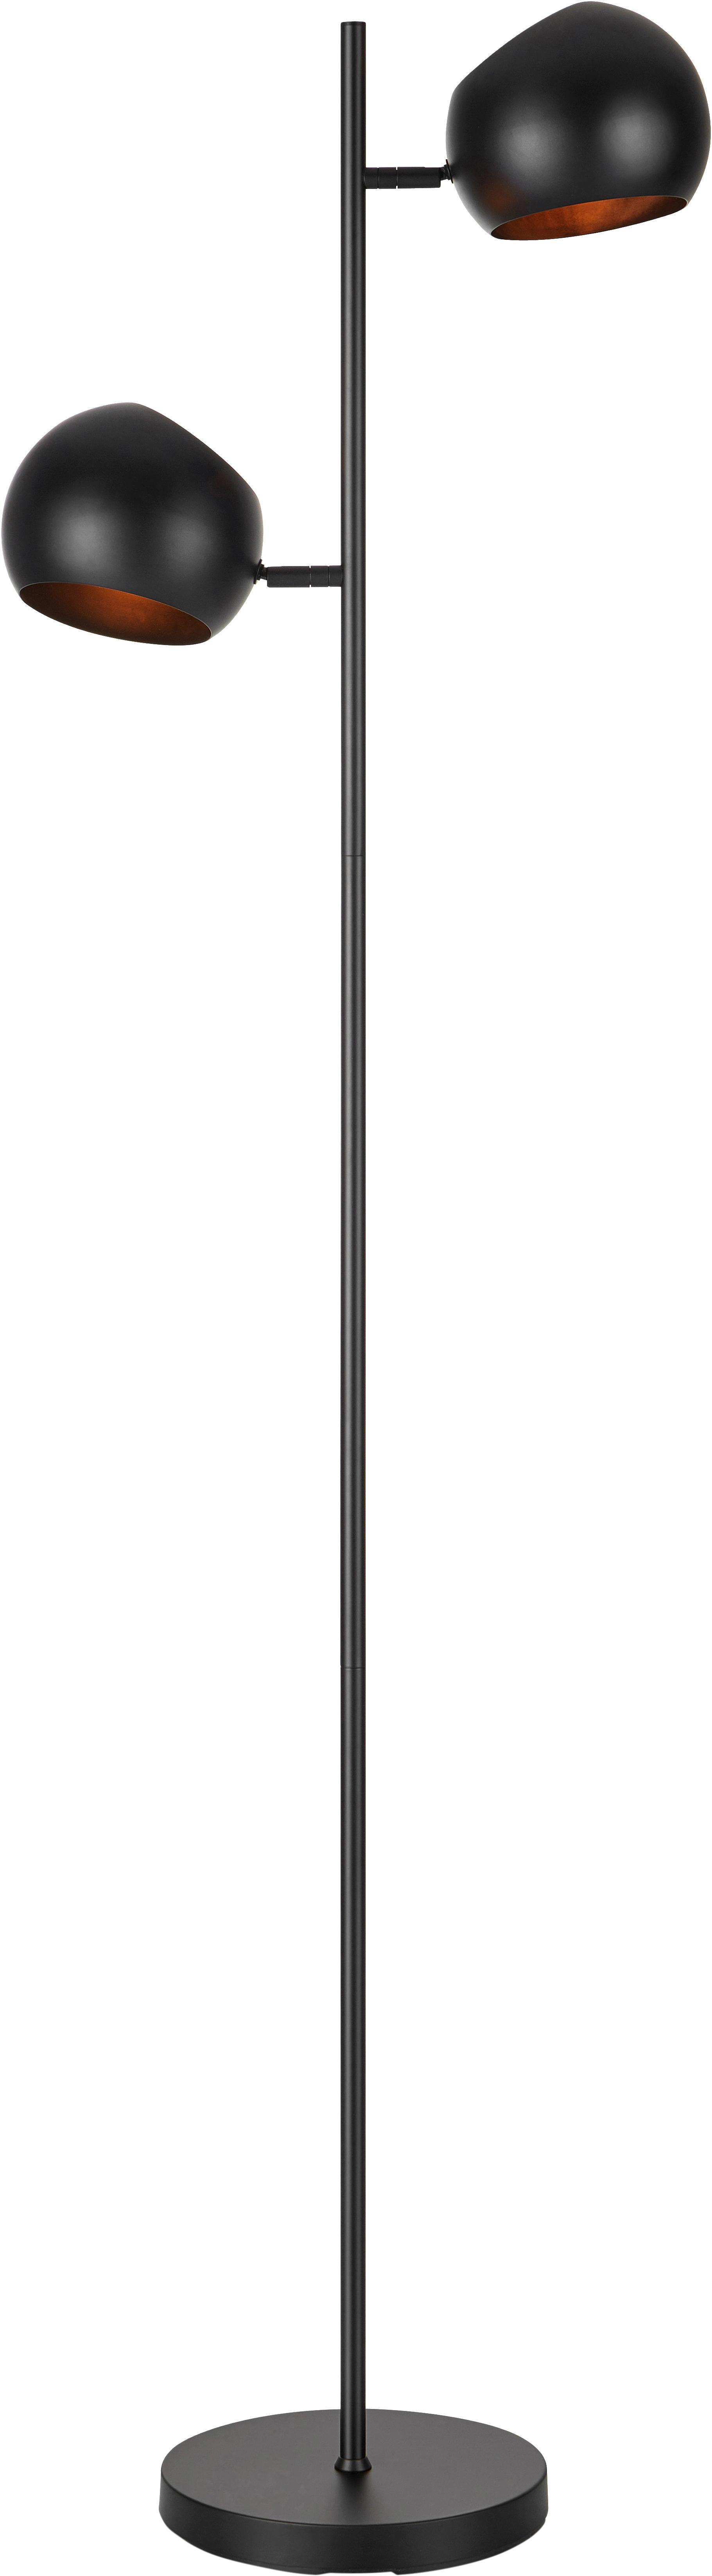 Stehlampe Edgar in Schwarz, Lampenschirm: Metall, lackiert, Lampenfuß: Metall, lackiert, Schwarz, 40 x 145 cm